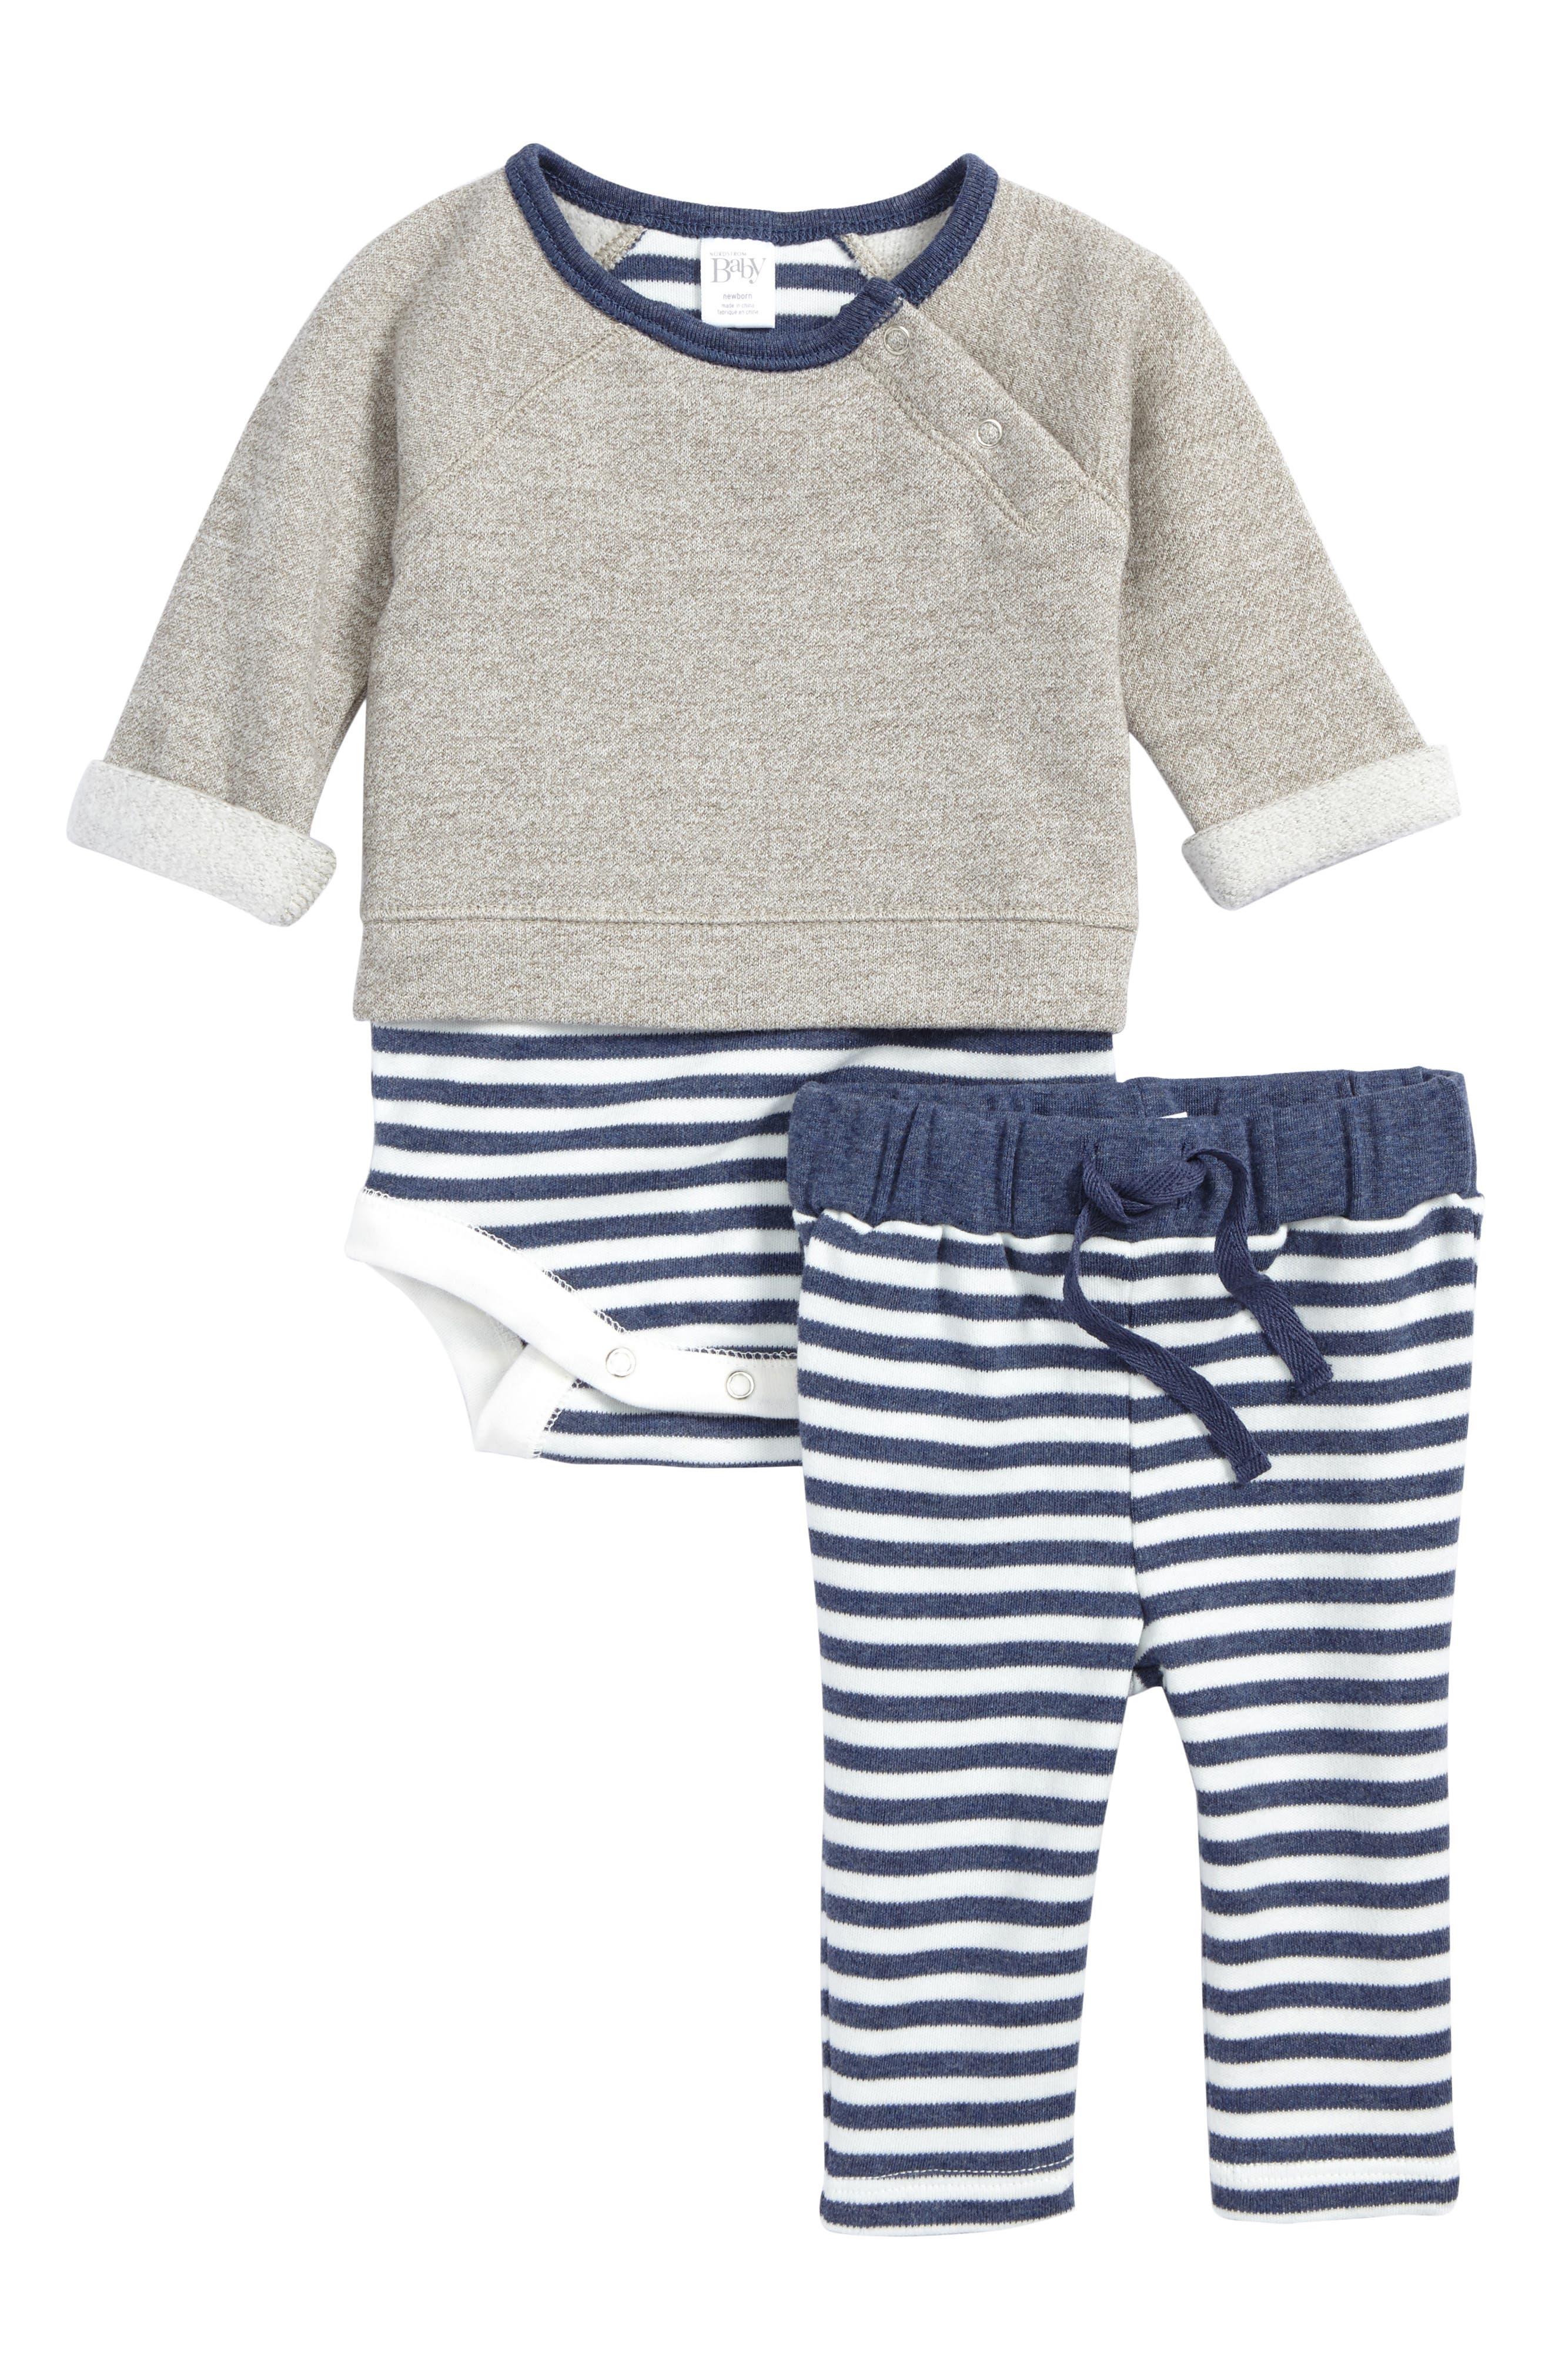 Alternate Image 1 Selected - Nordstrom Baby Bodysuit & Pants Set (Baby Boys)